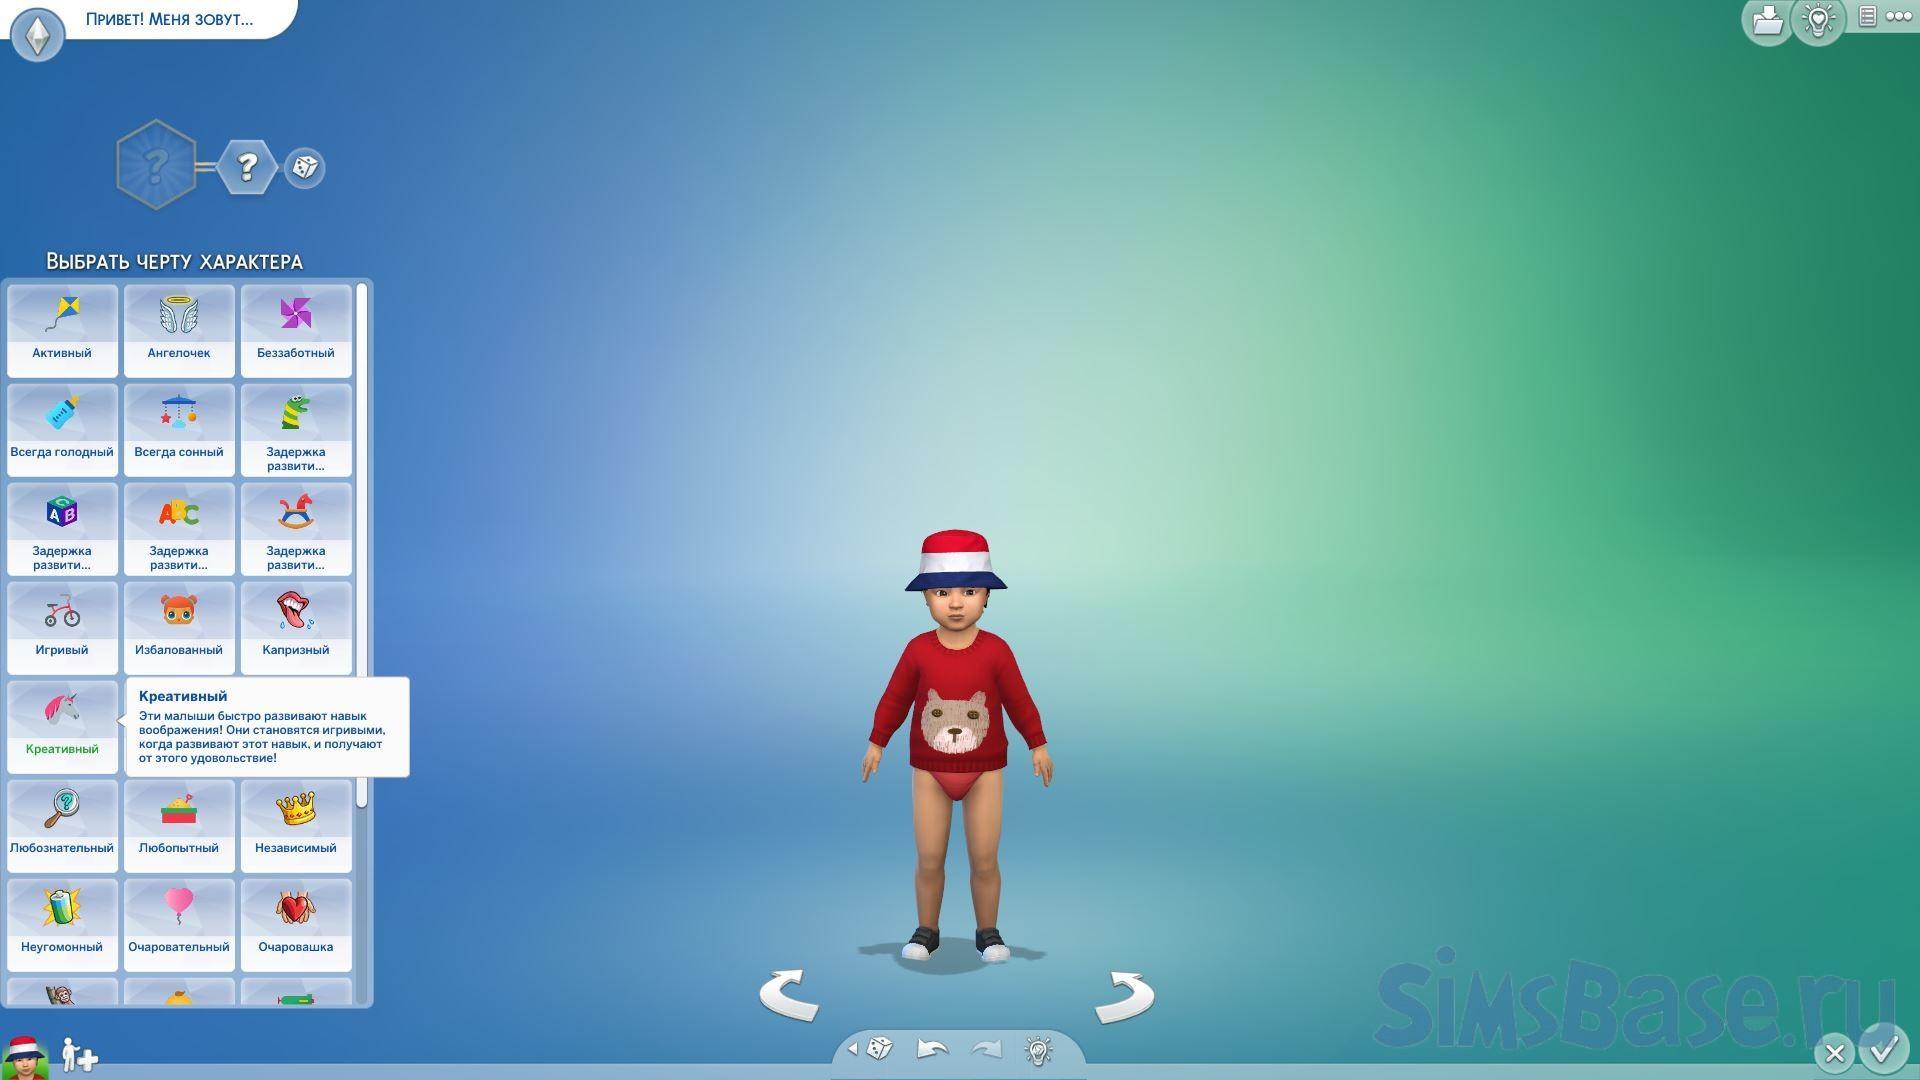 Мод «20 черт характера для малышей версия 2» от Vicky Sims для Sims 4